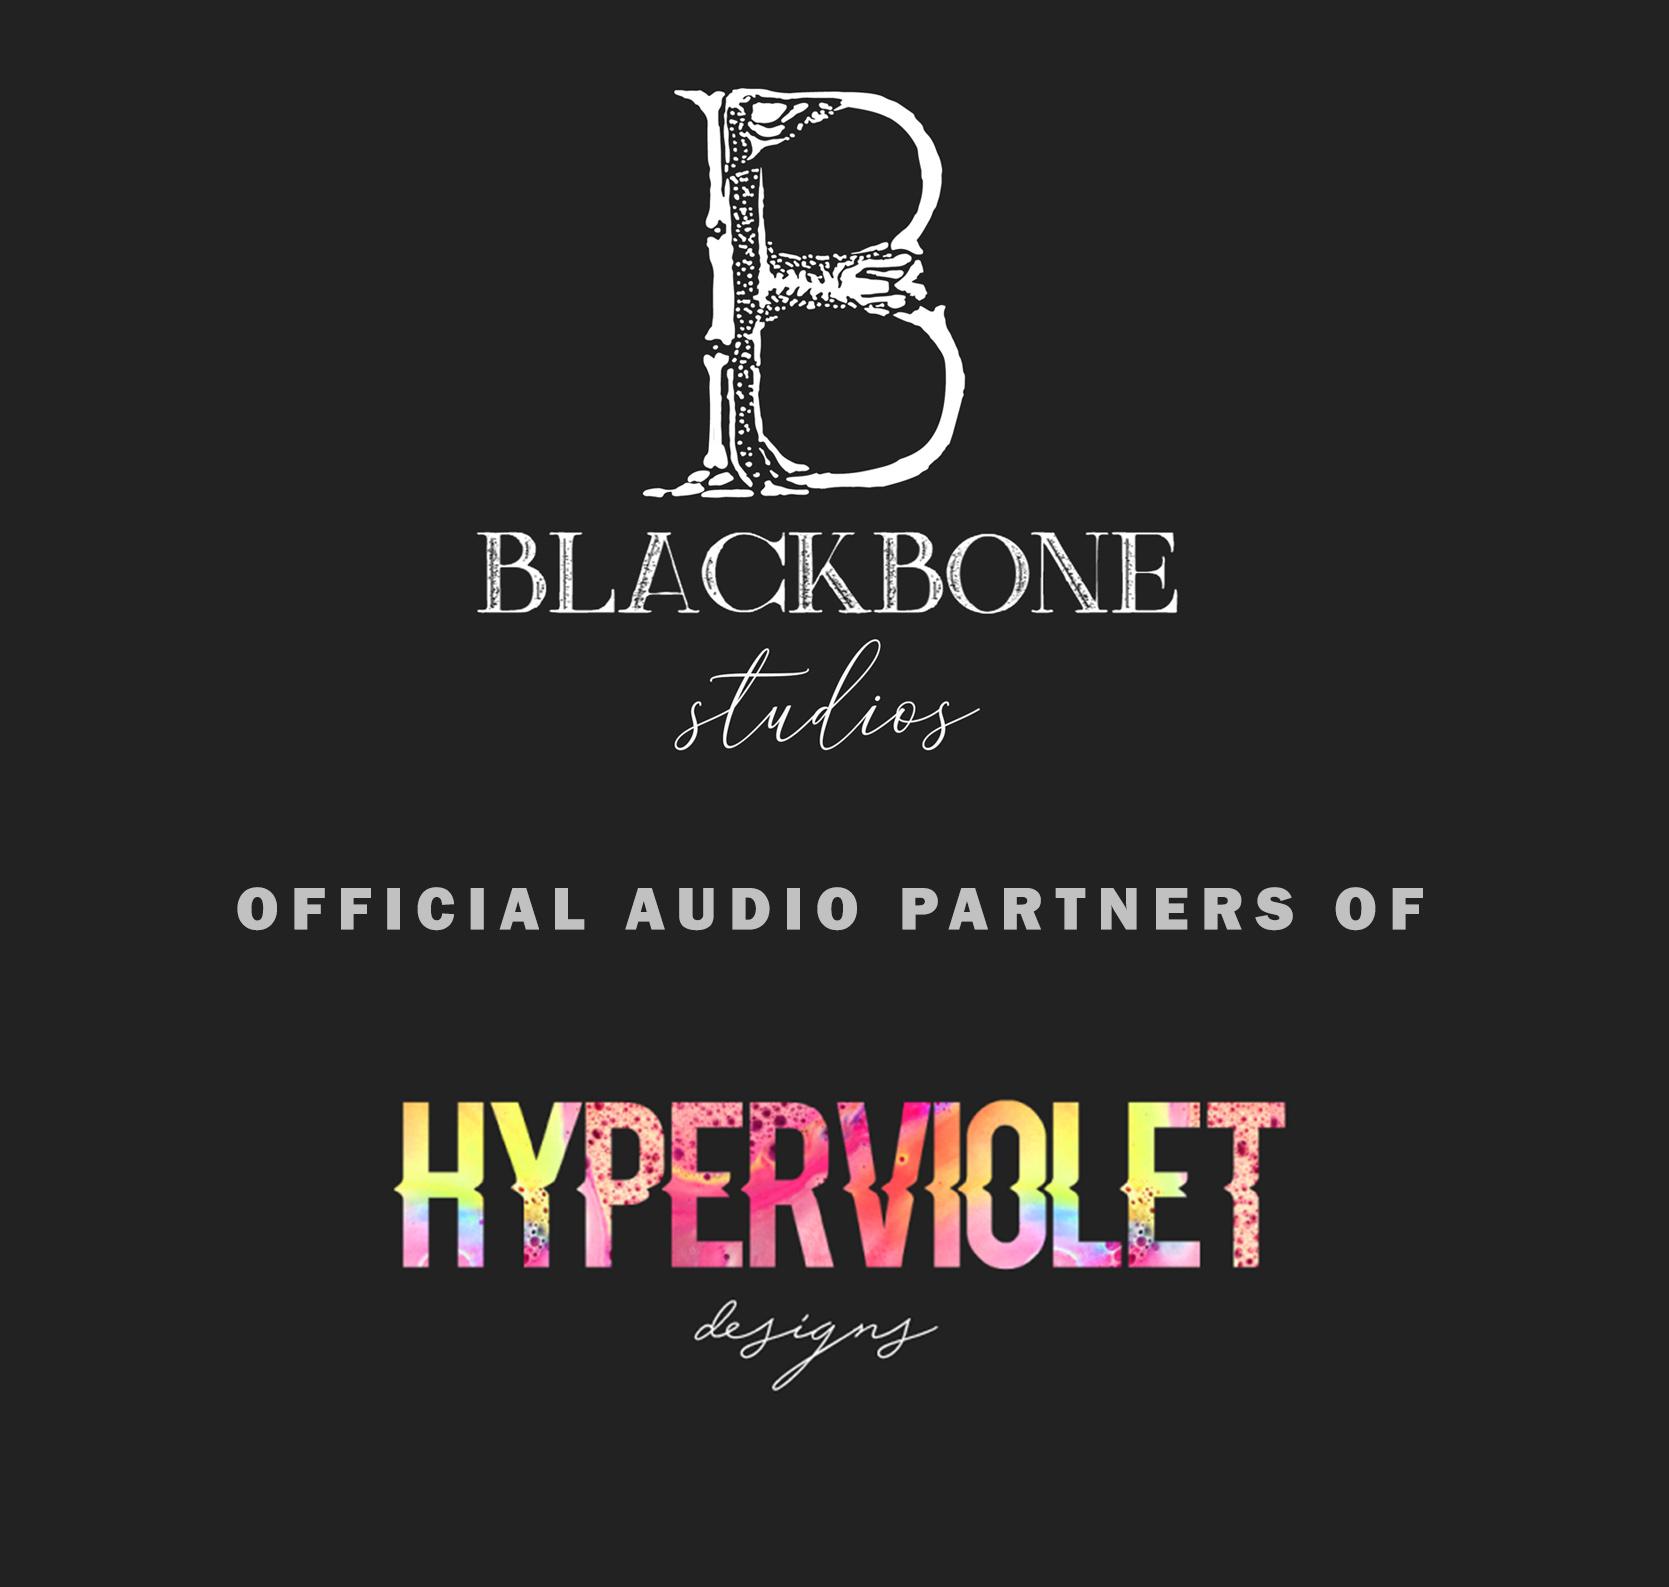 BlackBone-Studios-hv.jpg